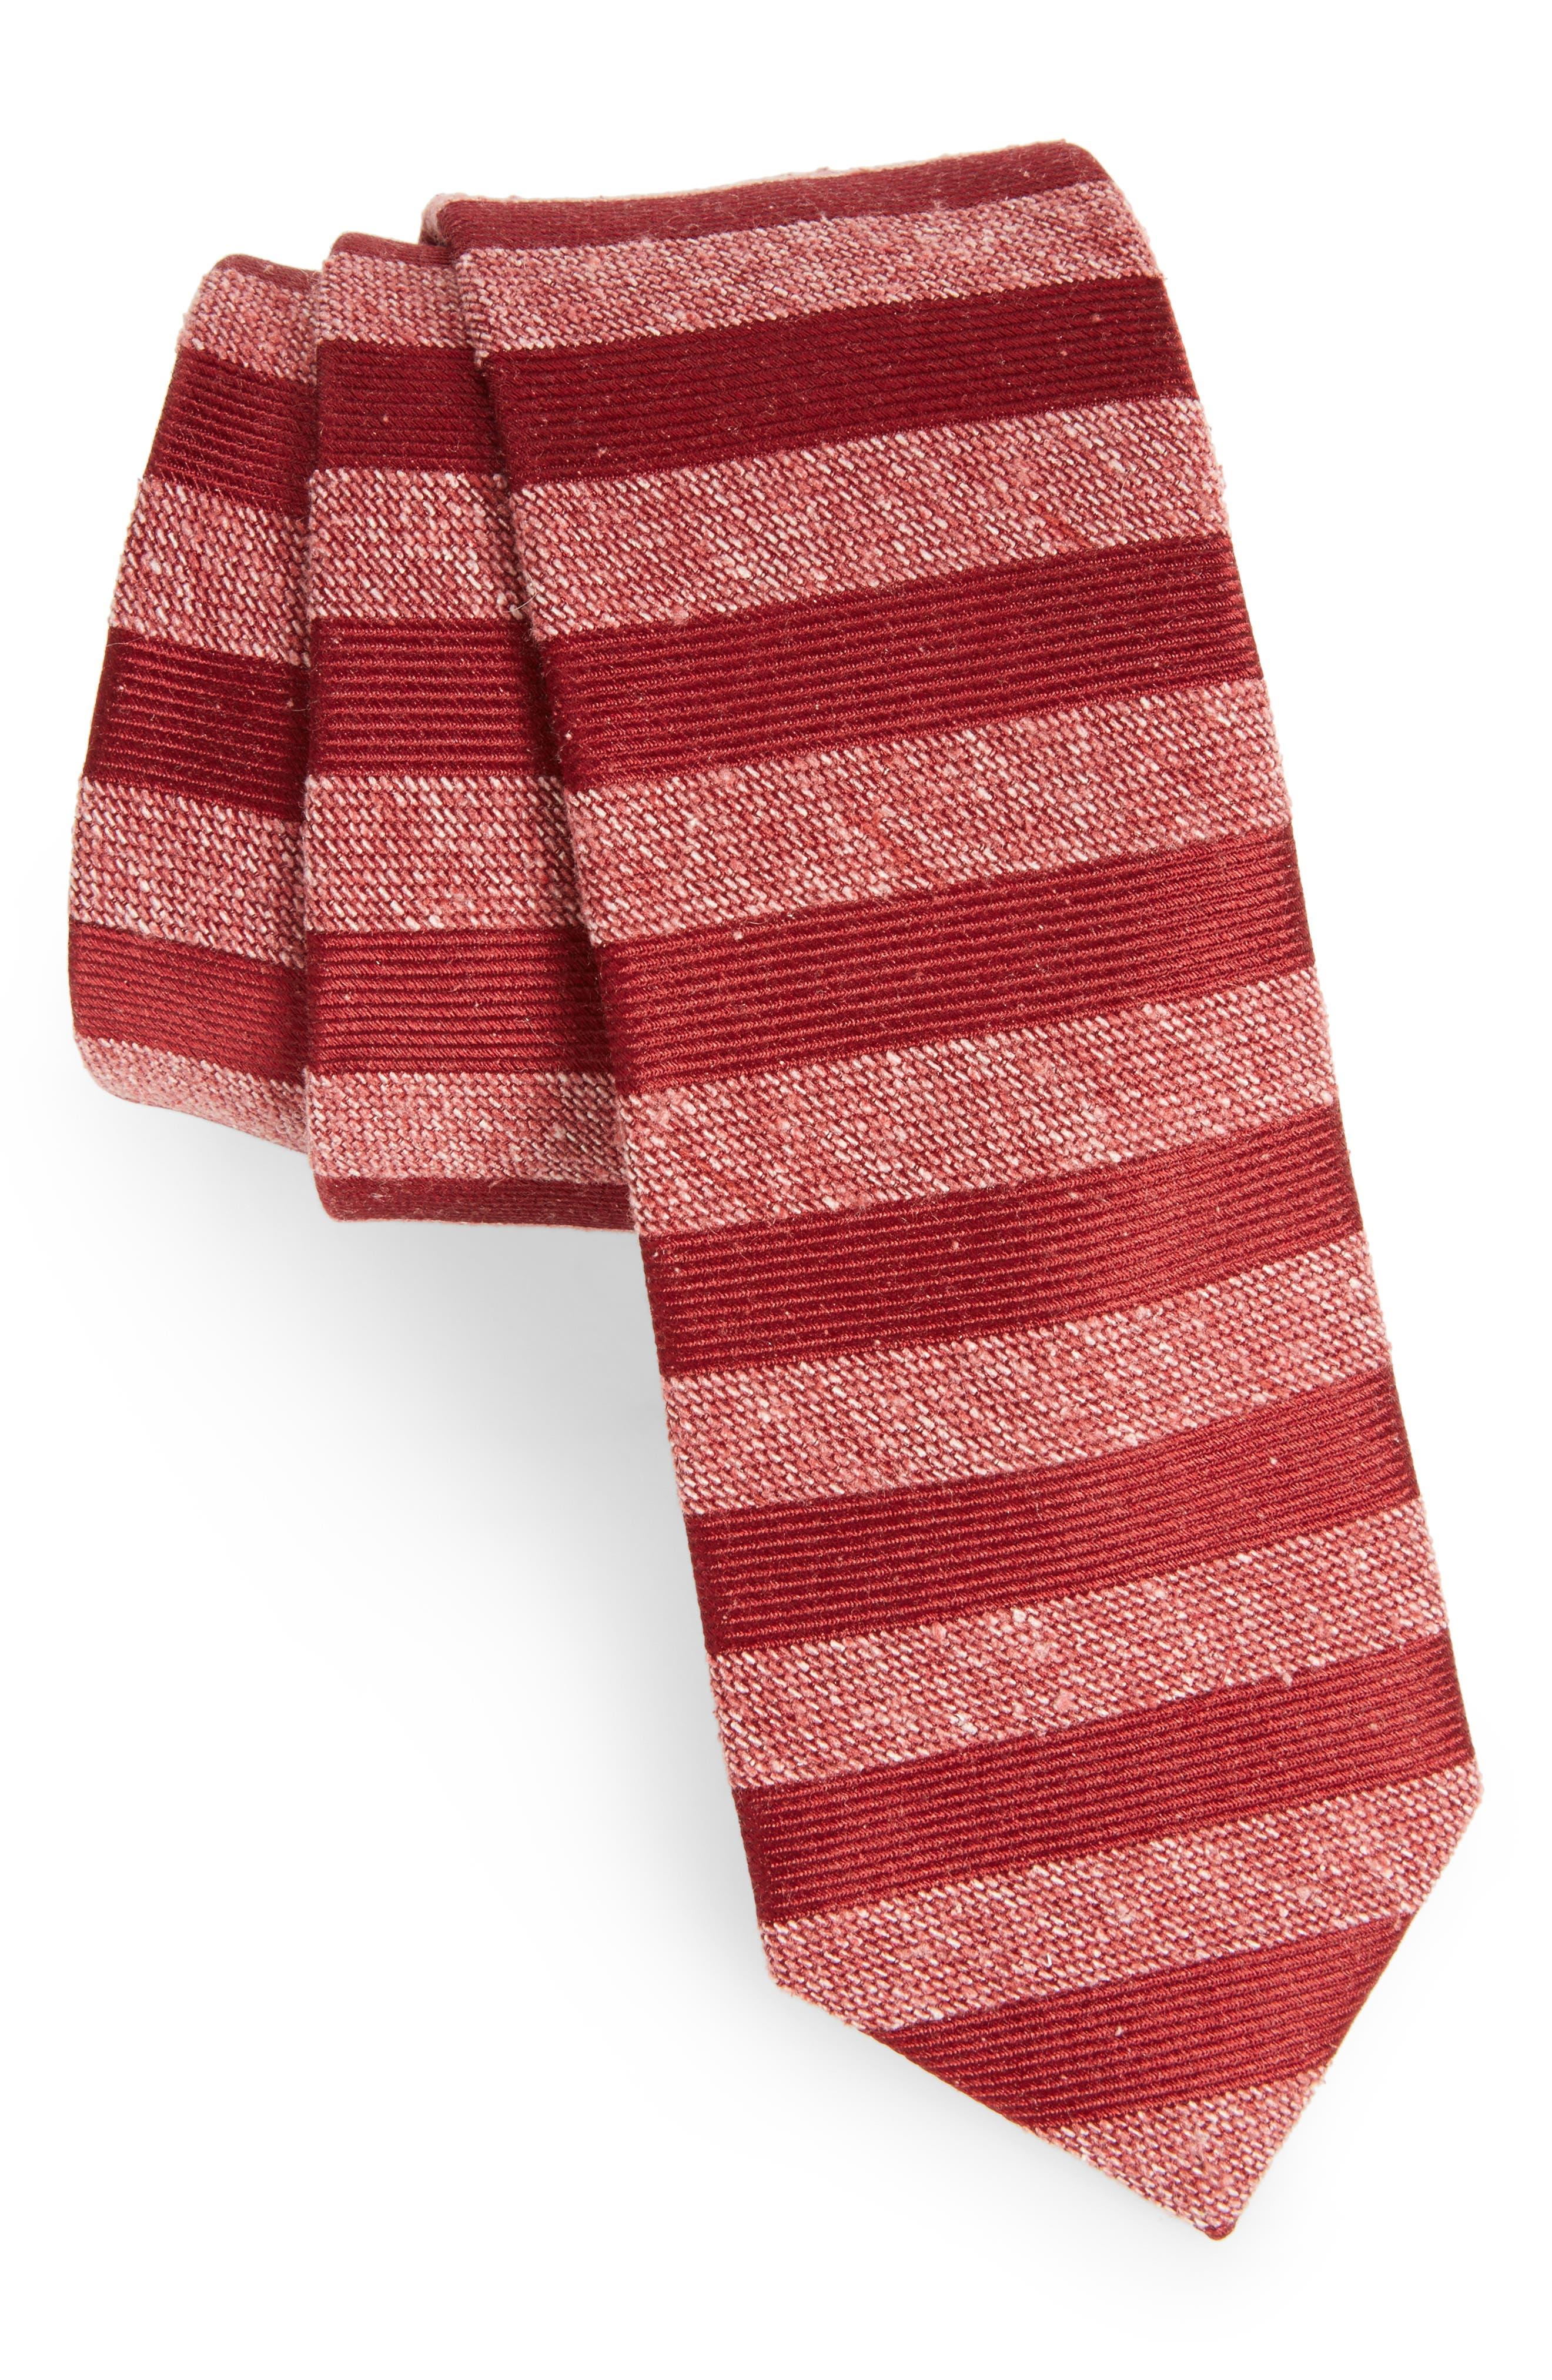 THE TIE BAR Meter Stripe Nep Silk Tie